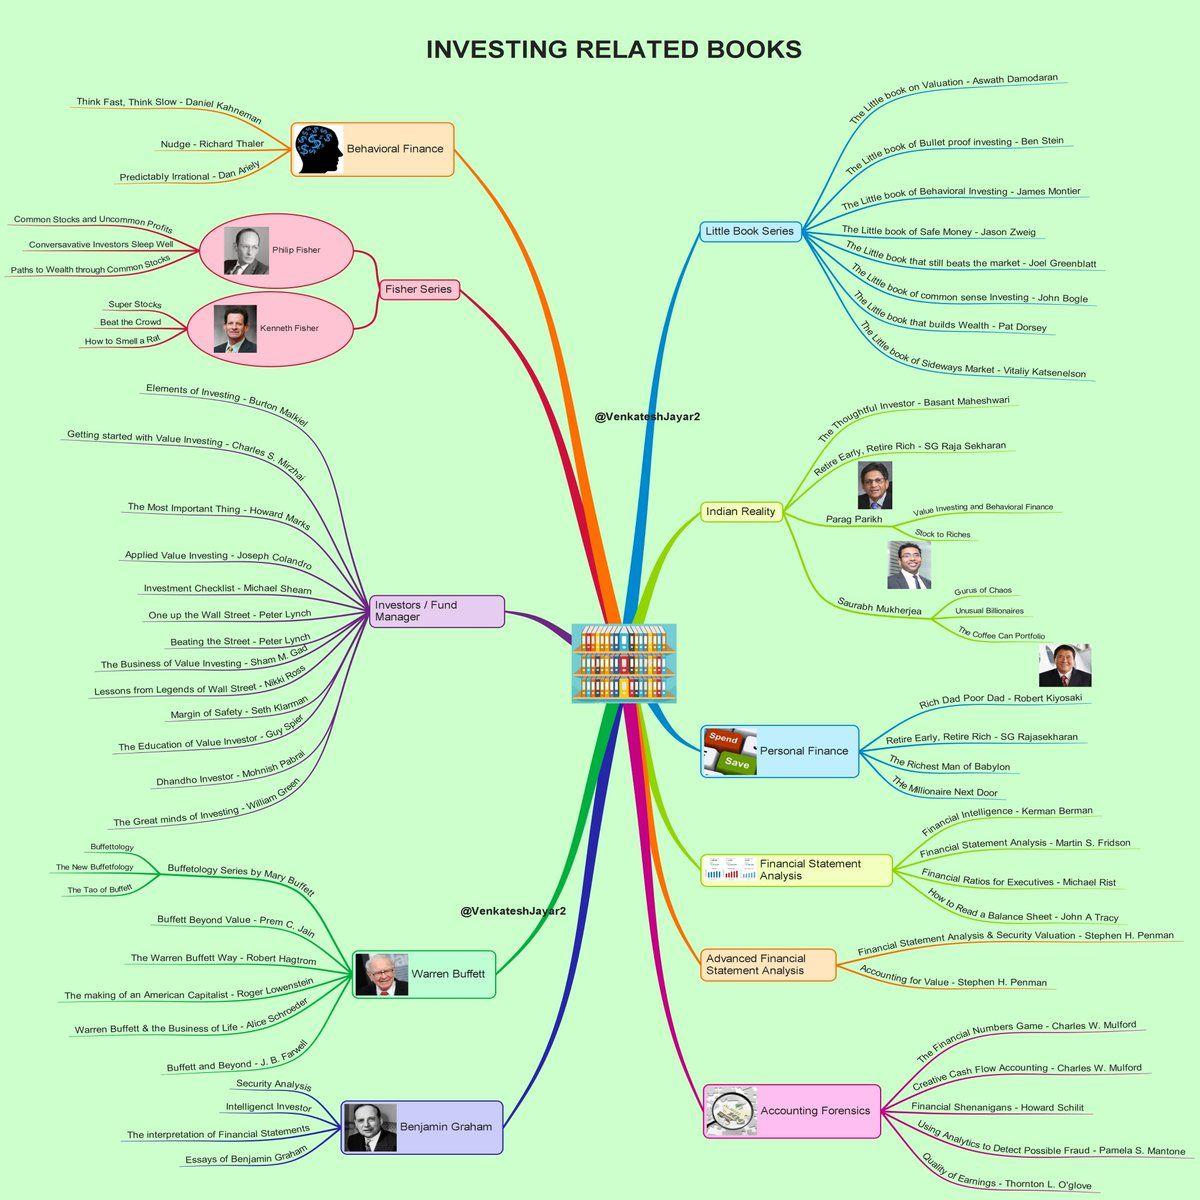 Venkatesh Jayaraman On Value Investing Life Changing Books